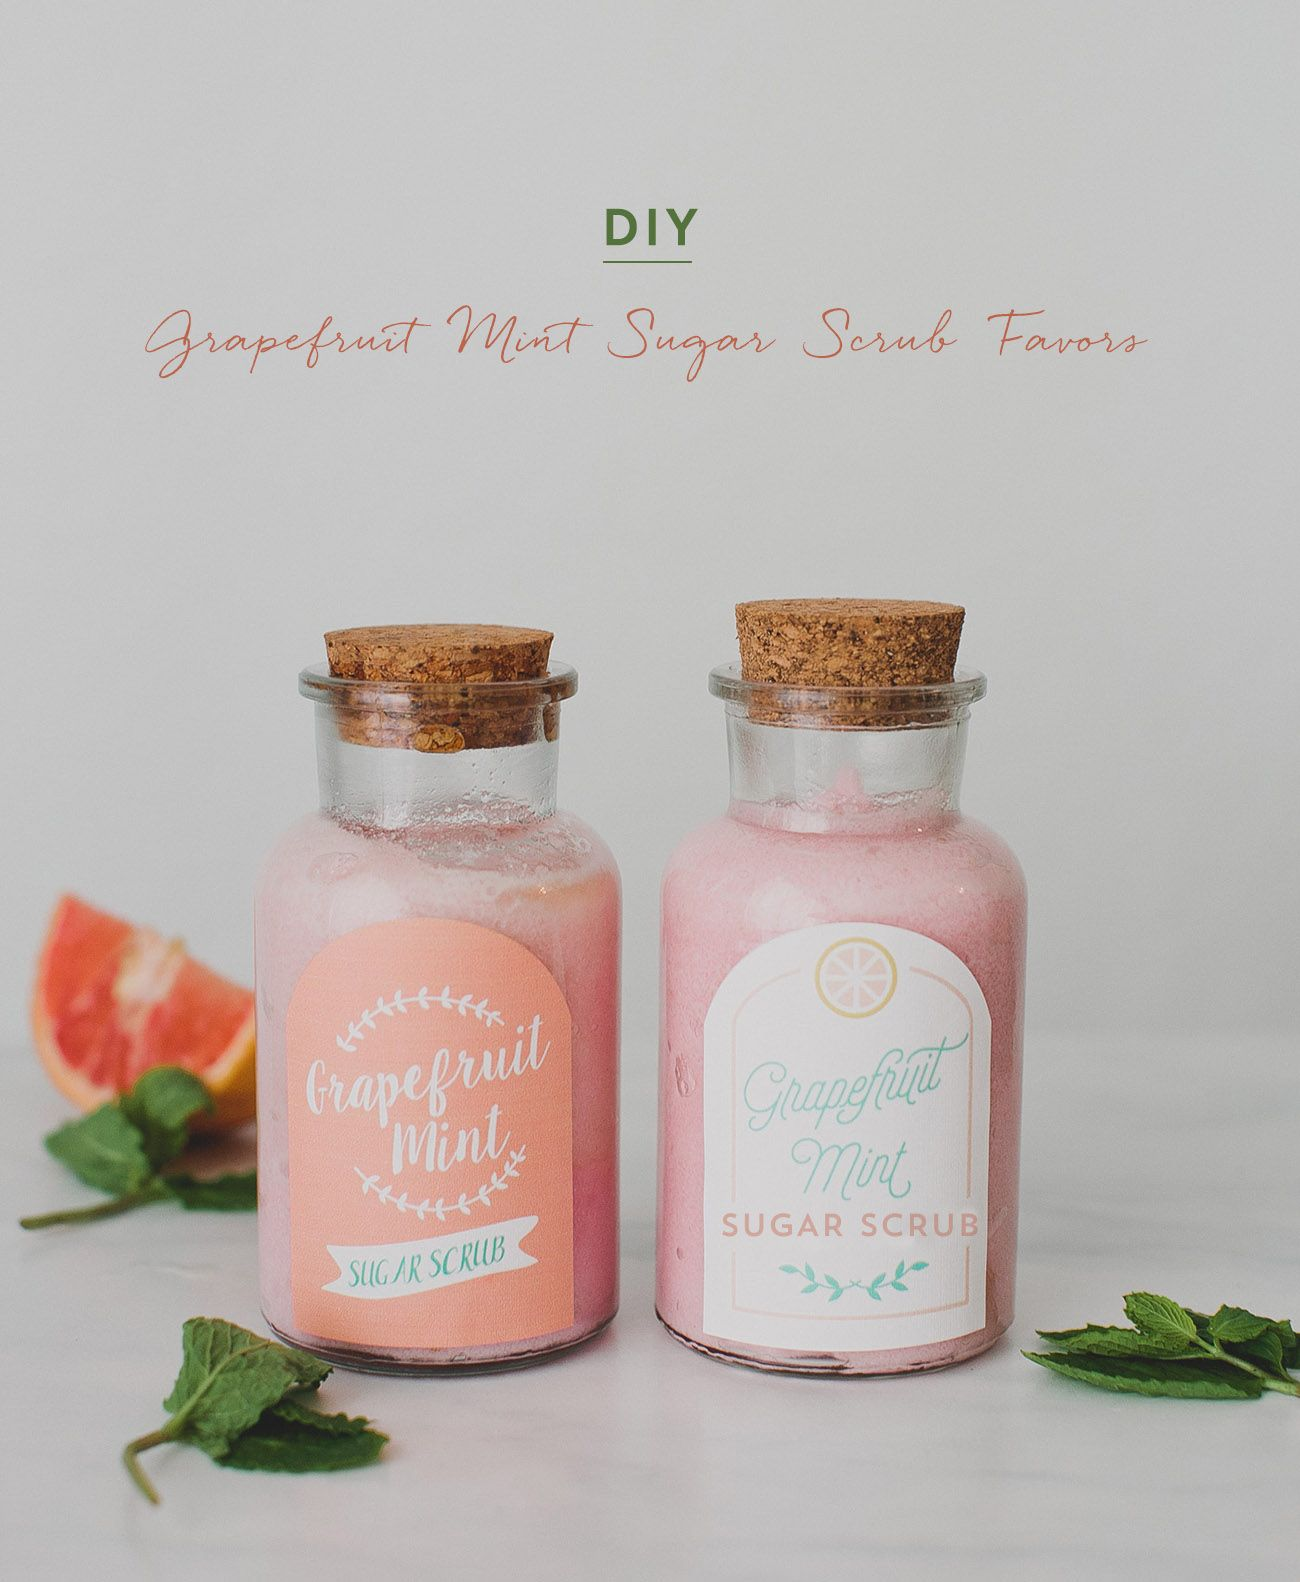 DIY Grapefruit Mint Sugar Scrub Favors | Grapefruit, Favours and Crafty